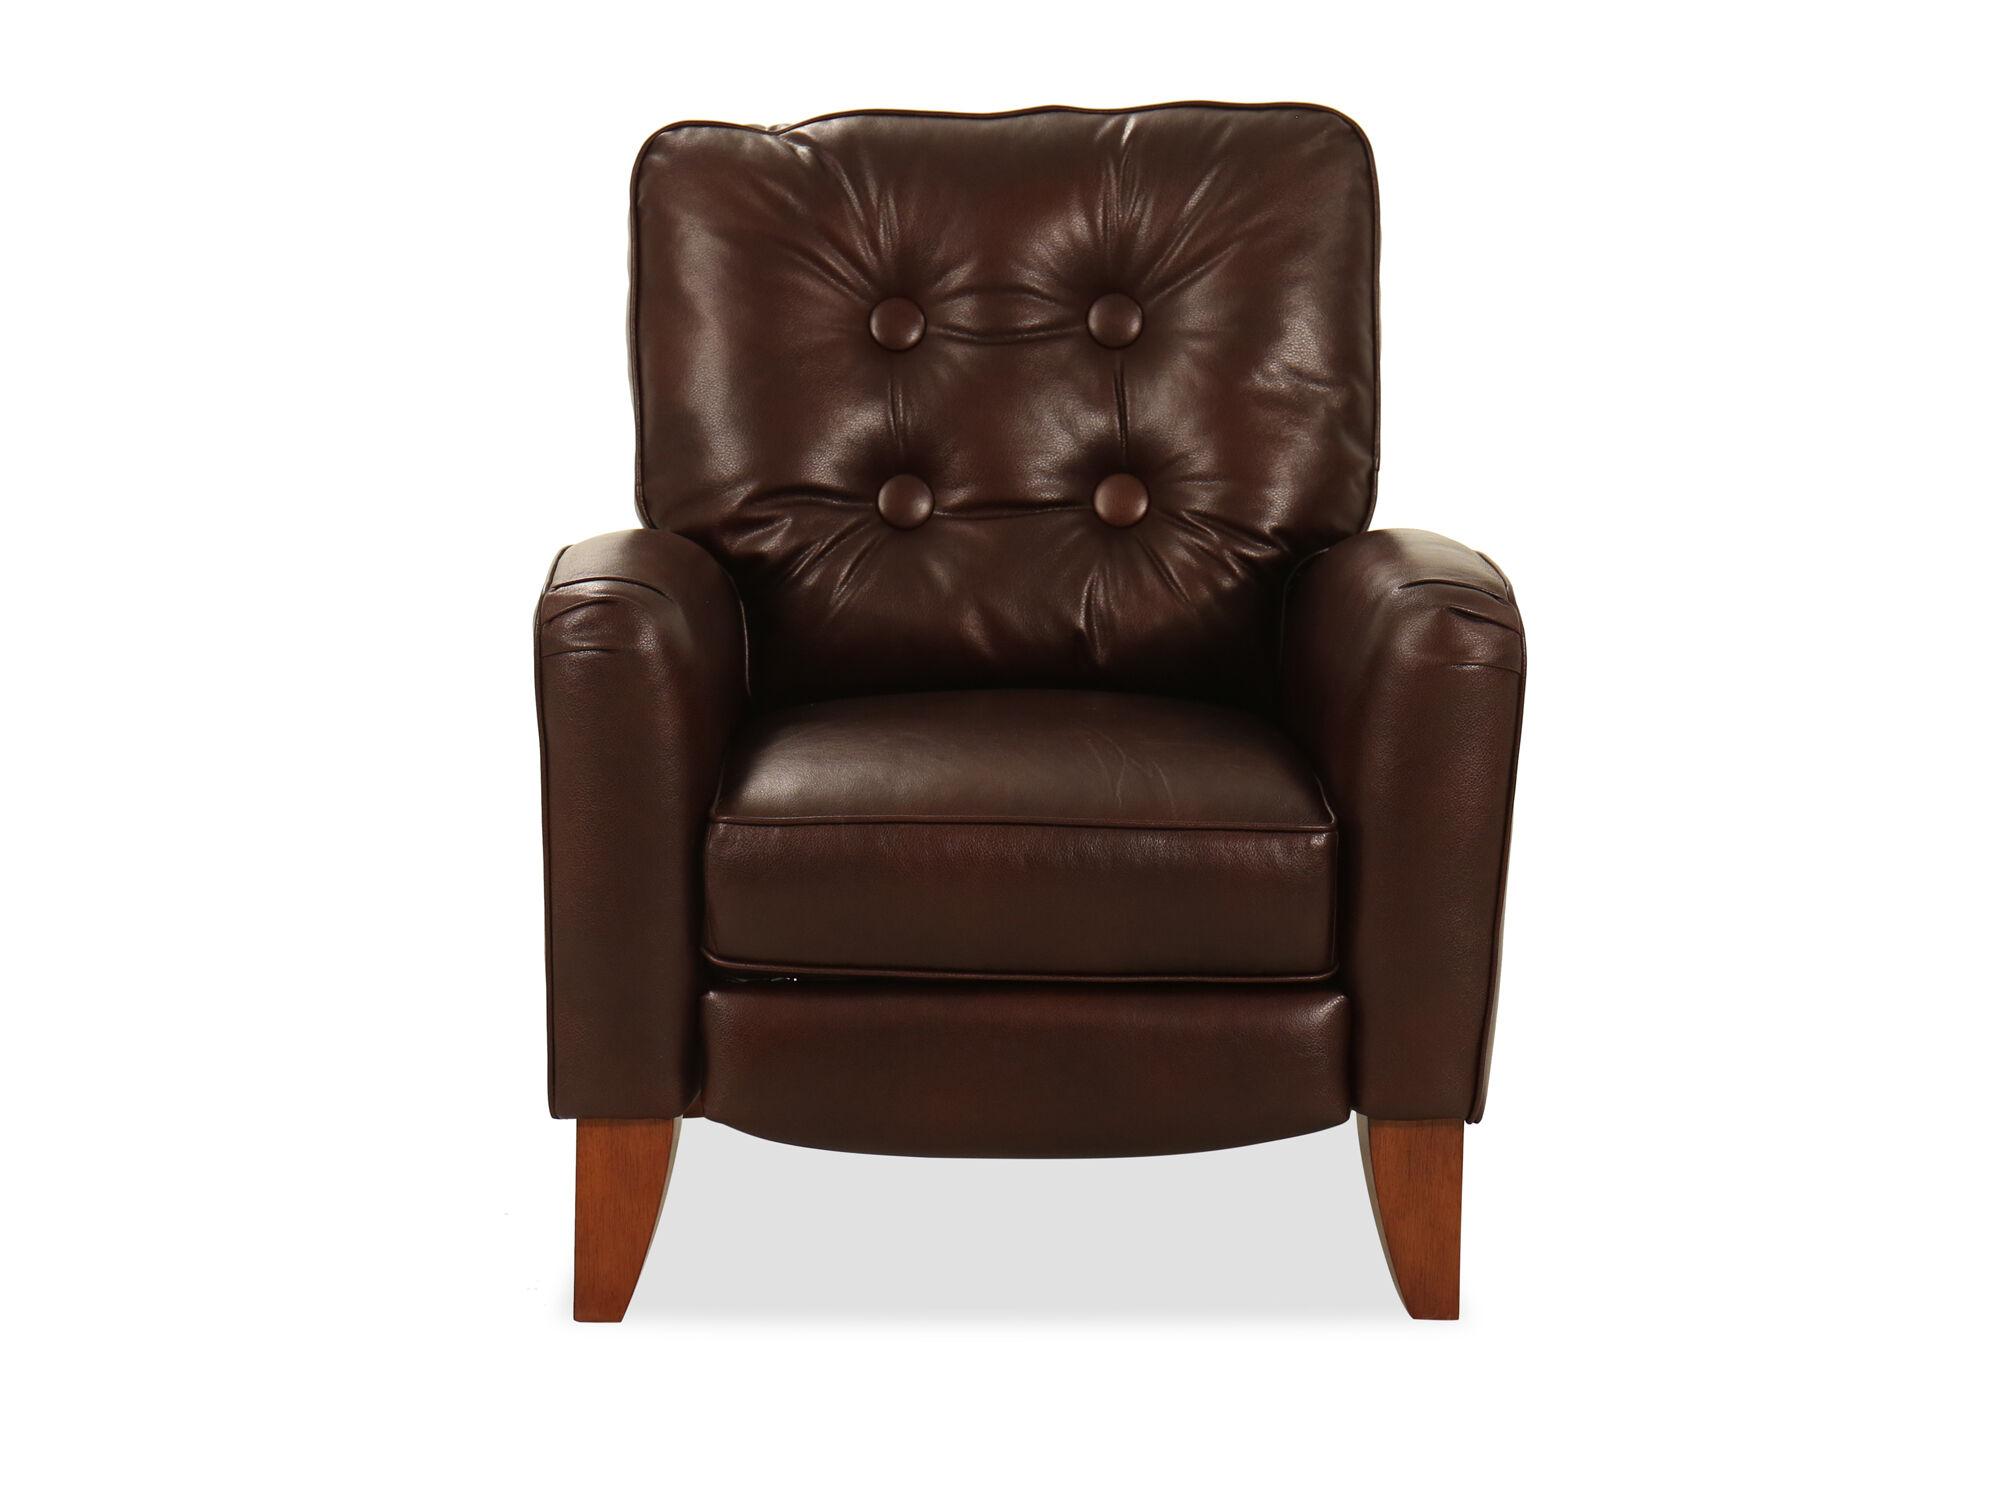 Bon Button Tufted Leather 32u0026quot; High Leg Recliner ...